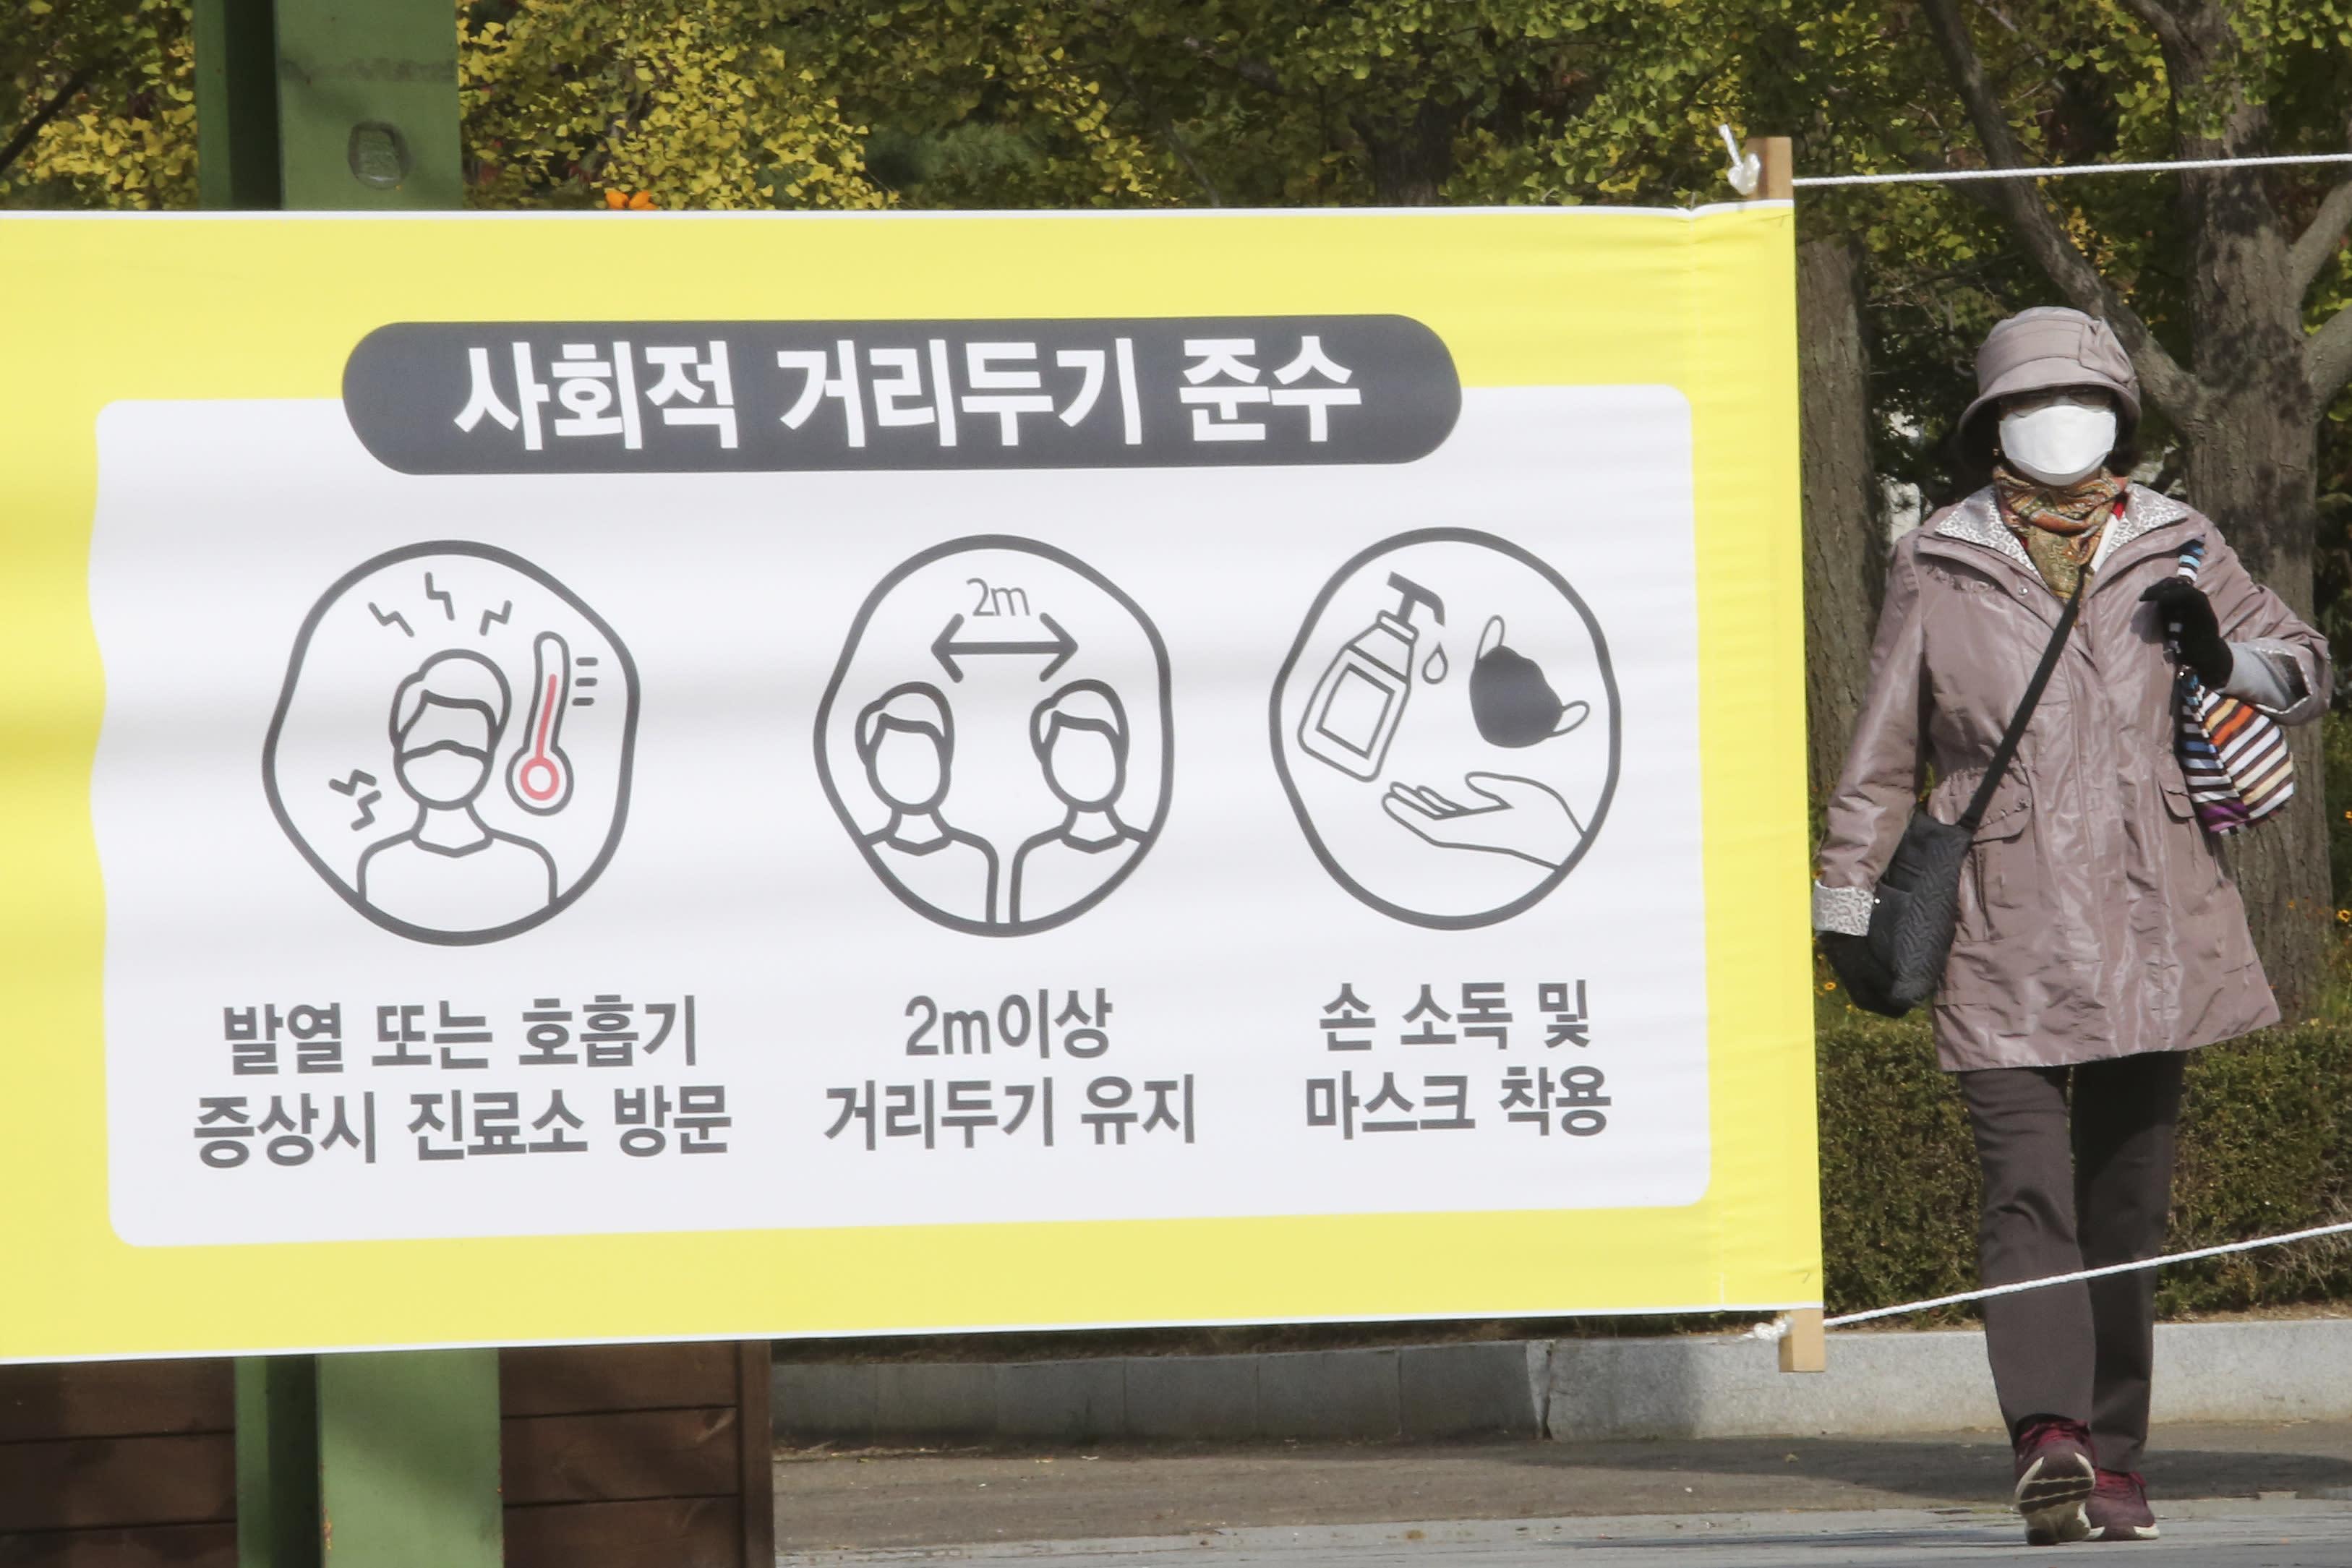 Asia Today: South Korea testing at hospitals, nursing homes